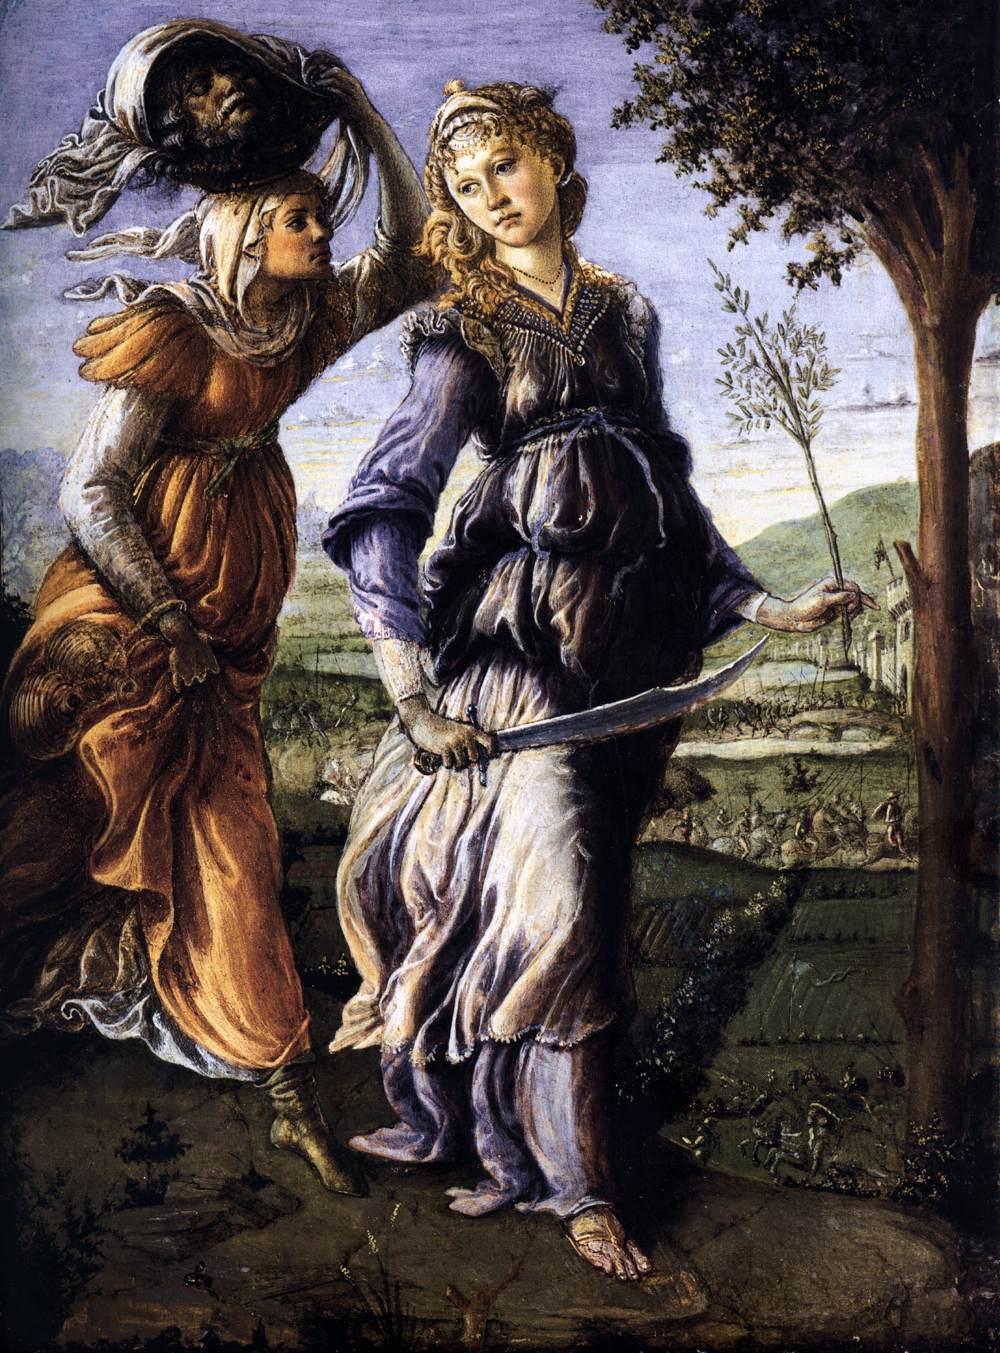 O regresso de Judith a Betulia (1472-1473), Galleria degli Uffizi, Florença.